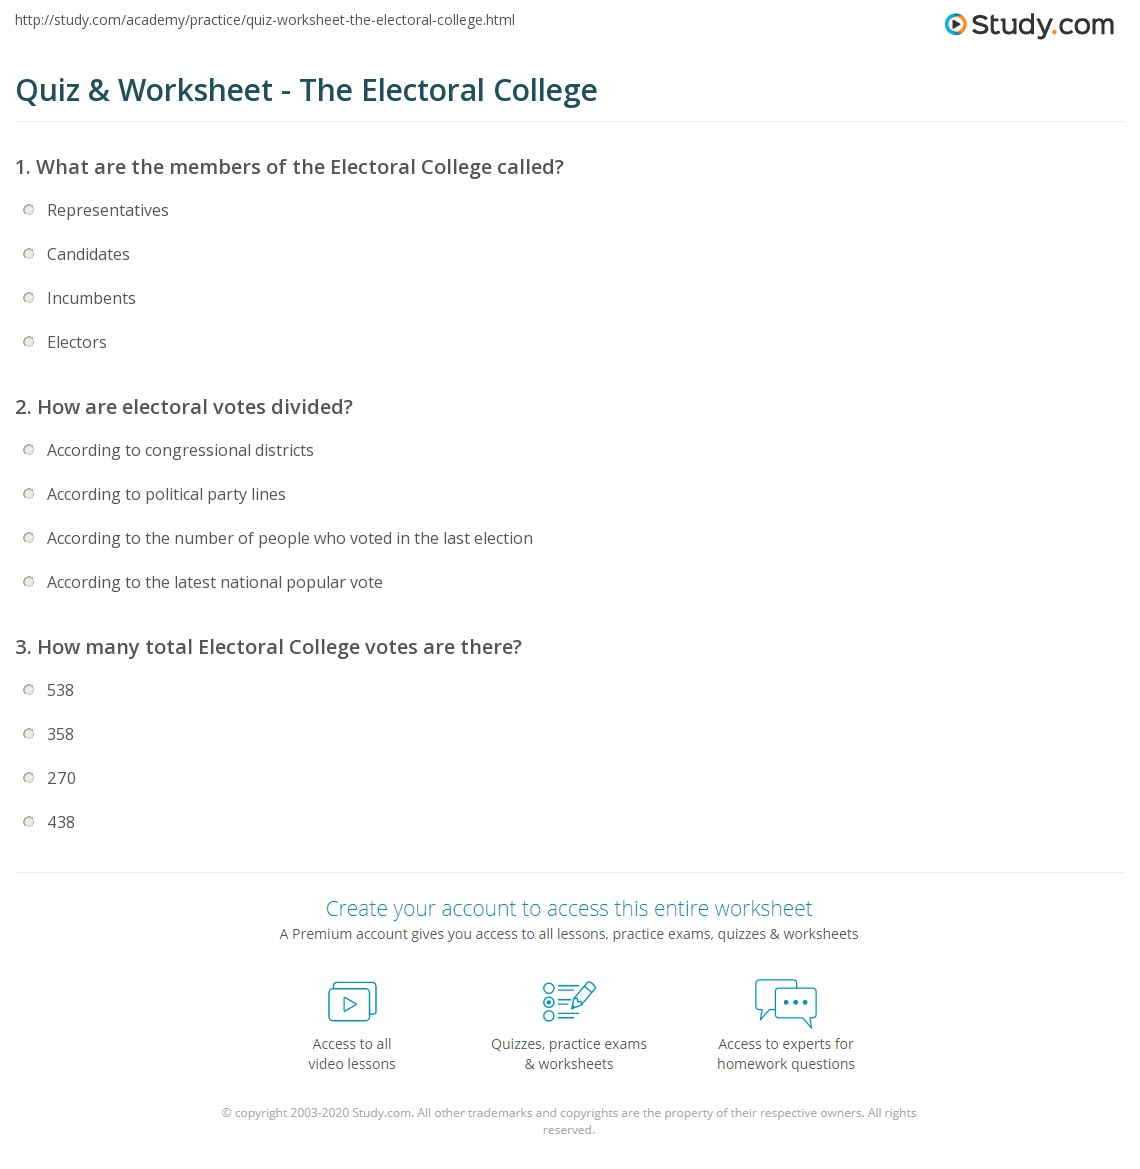 Worksheets Electoral College Worksheet quiz worksheet the electoral college study com print definition process worksheet